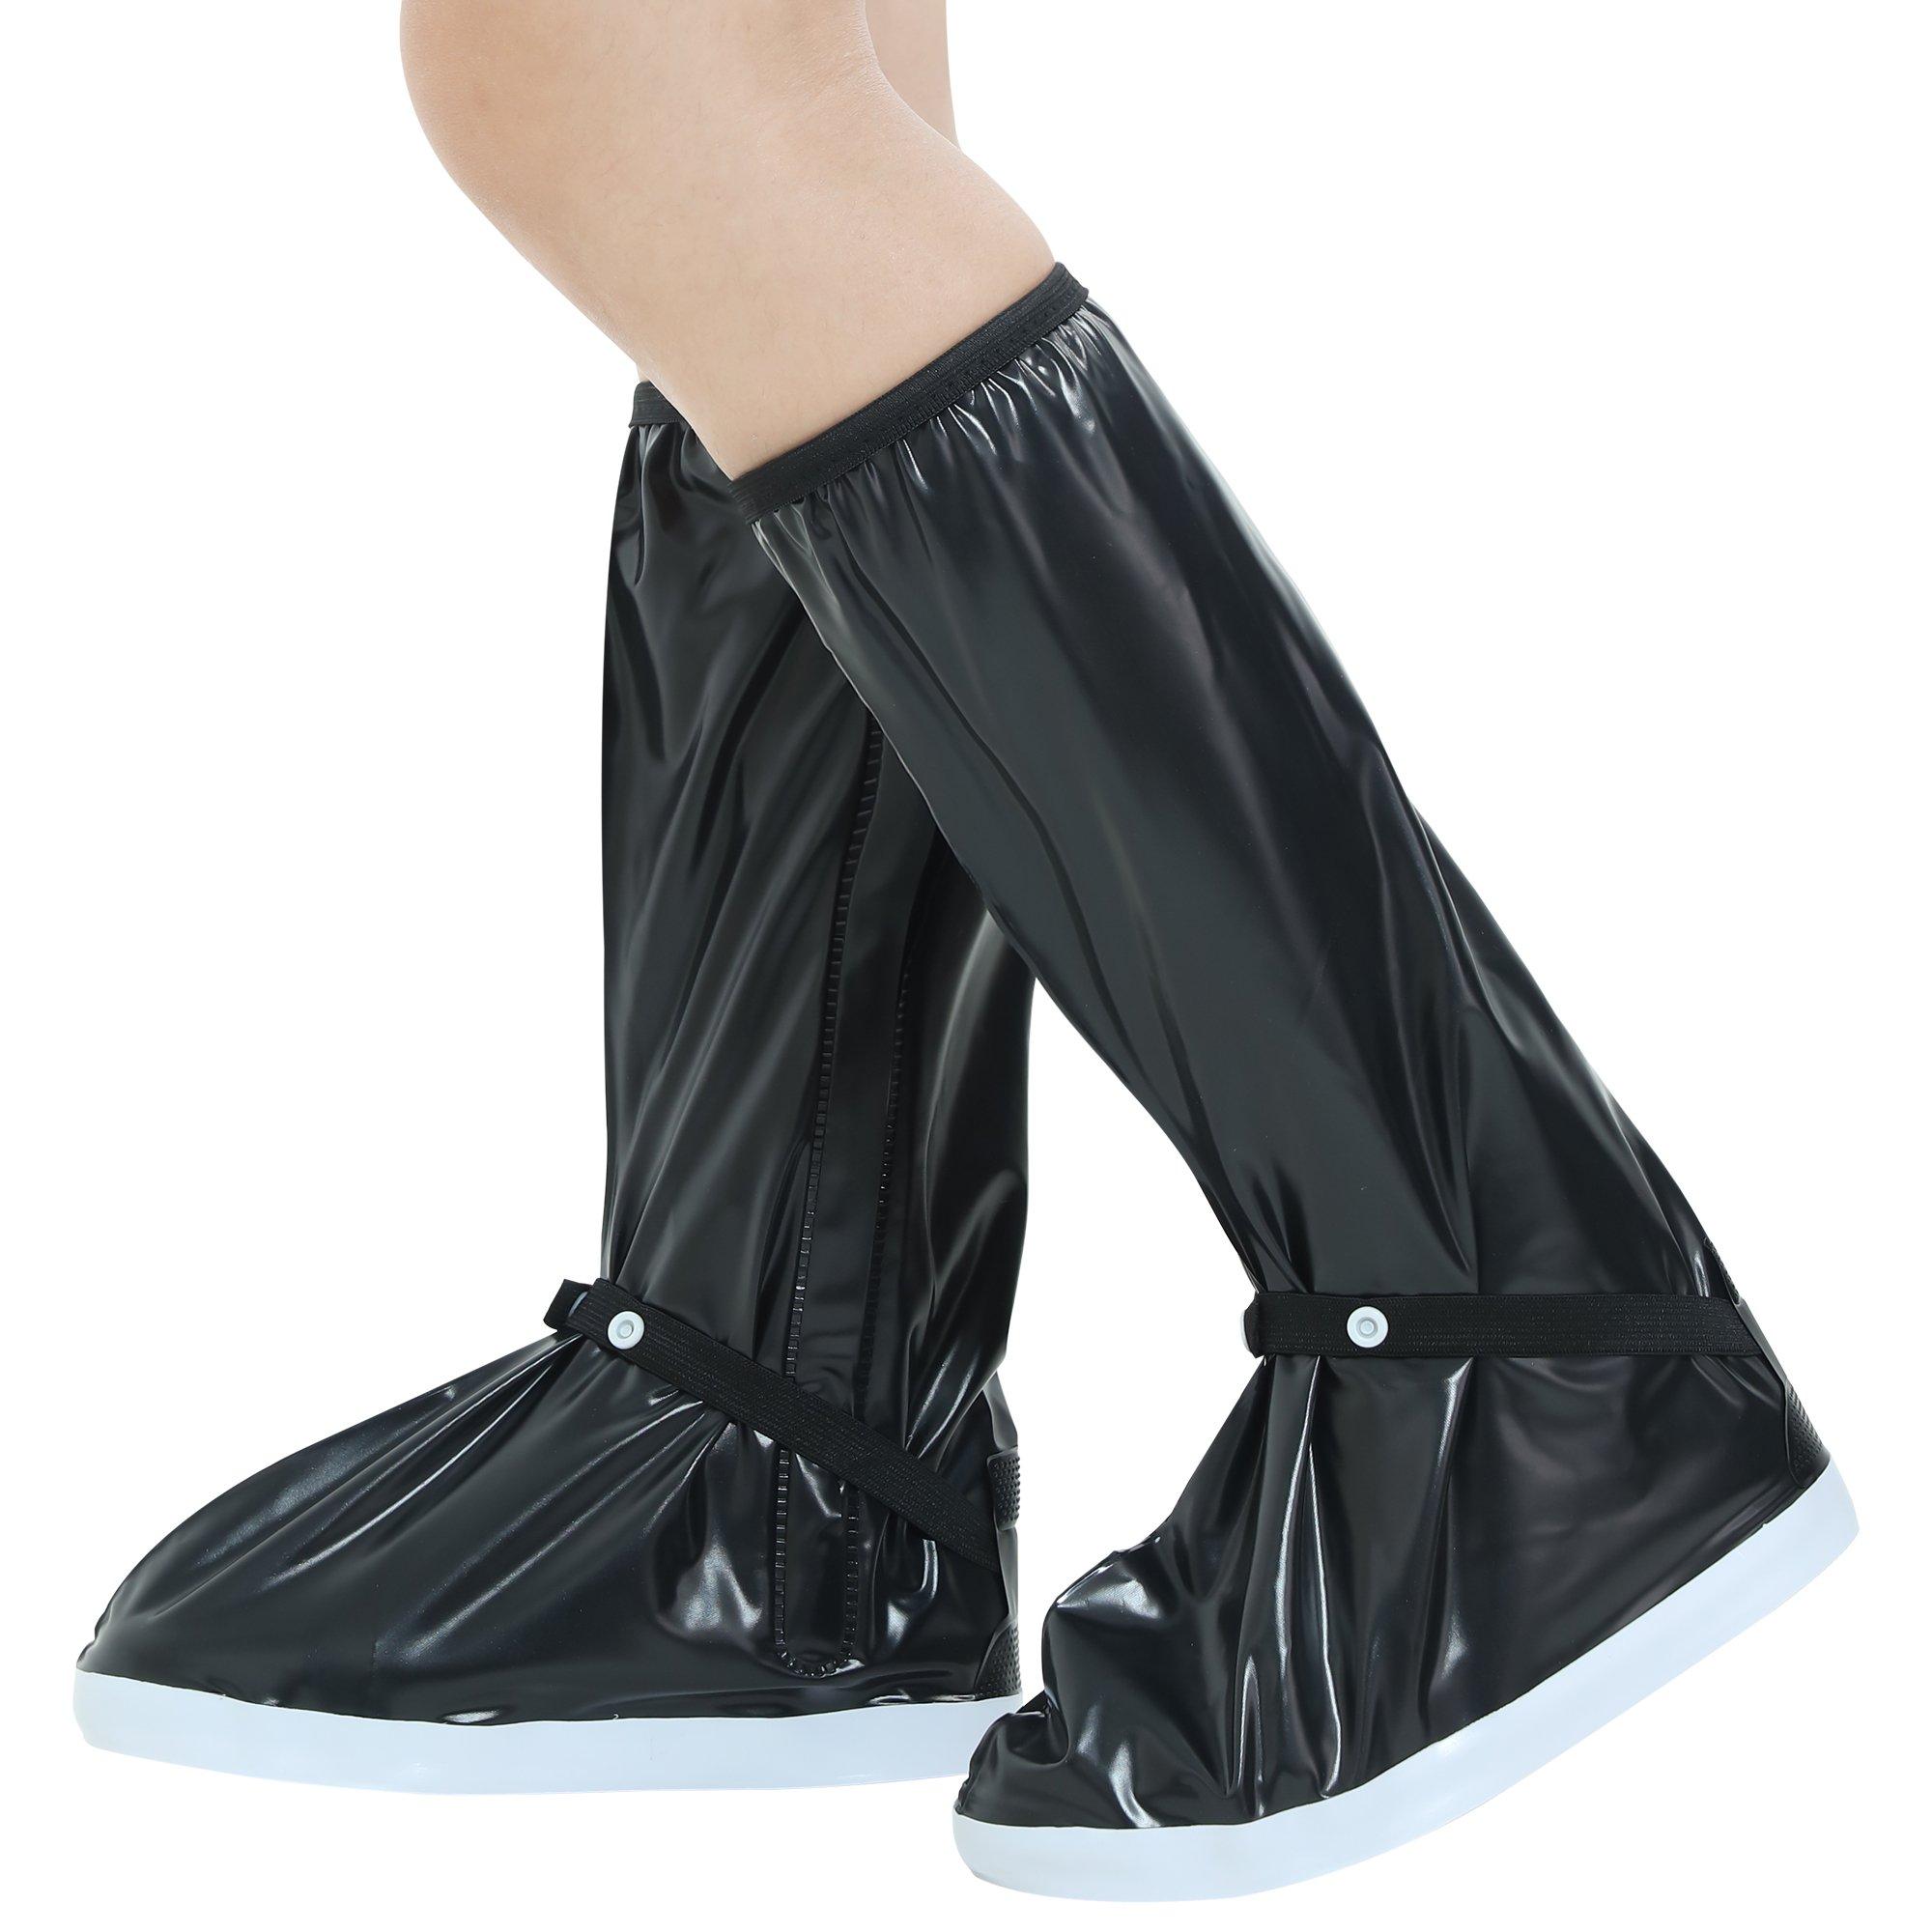 Waterproof Rain Boots Men Rainboots-Waterproof shoes for Men Women Boots covers Waterproof hiking shoe covers Rain overshoes